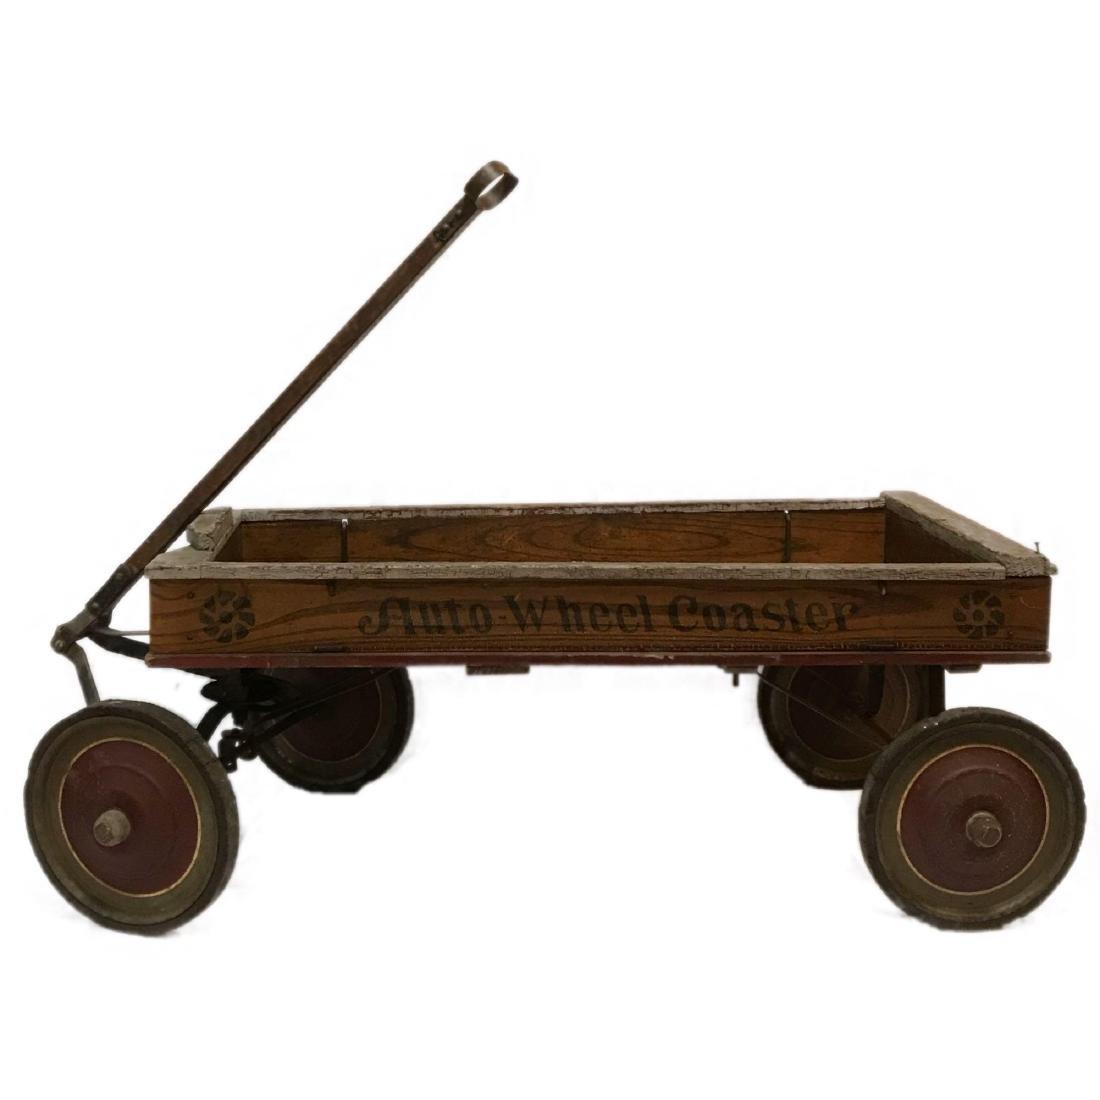 1916 Auto Wheel Coaster Wooden Wagon